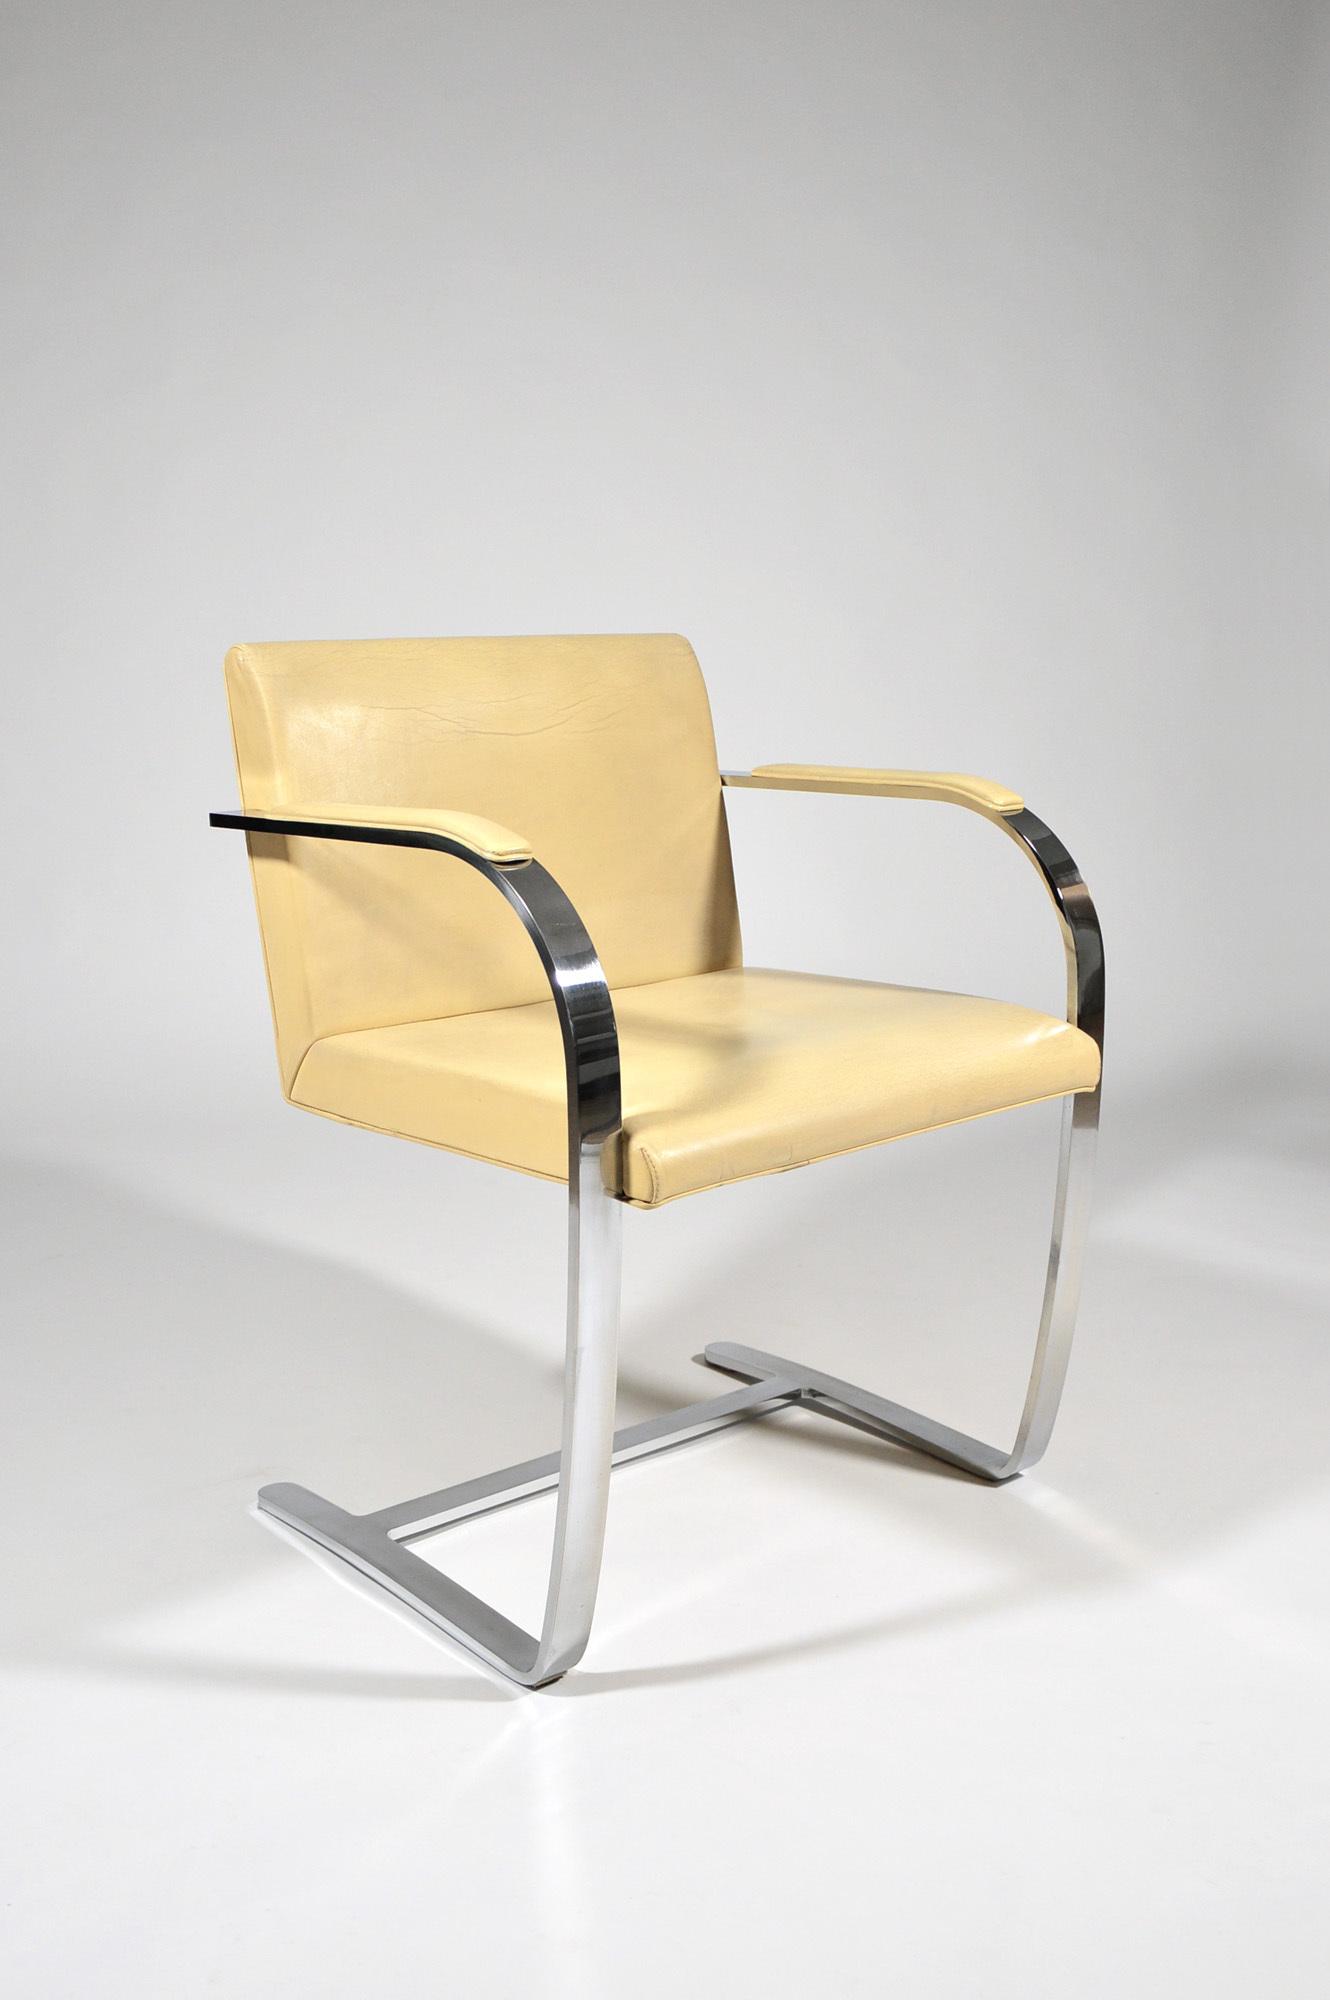 Chaise Brno Mies Van Der Rohe brno flat bar chairludwig mies van der rohe for knoll, 1930, 1/6